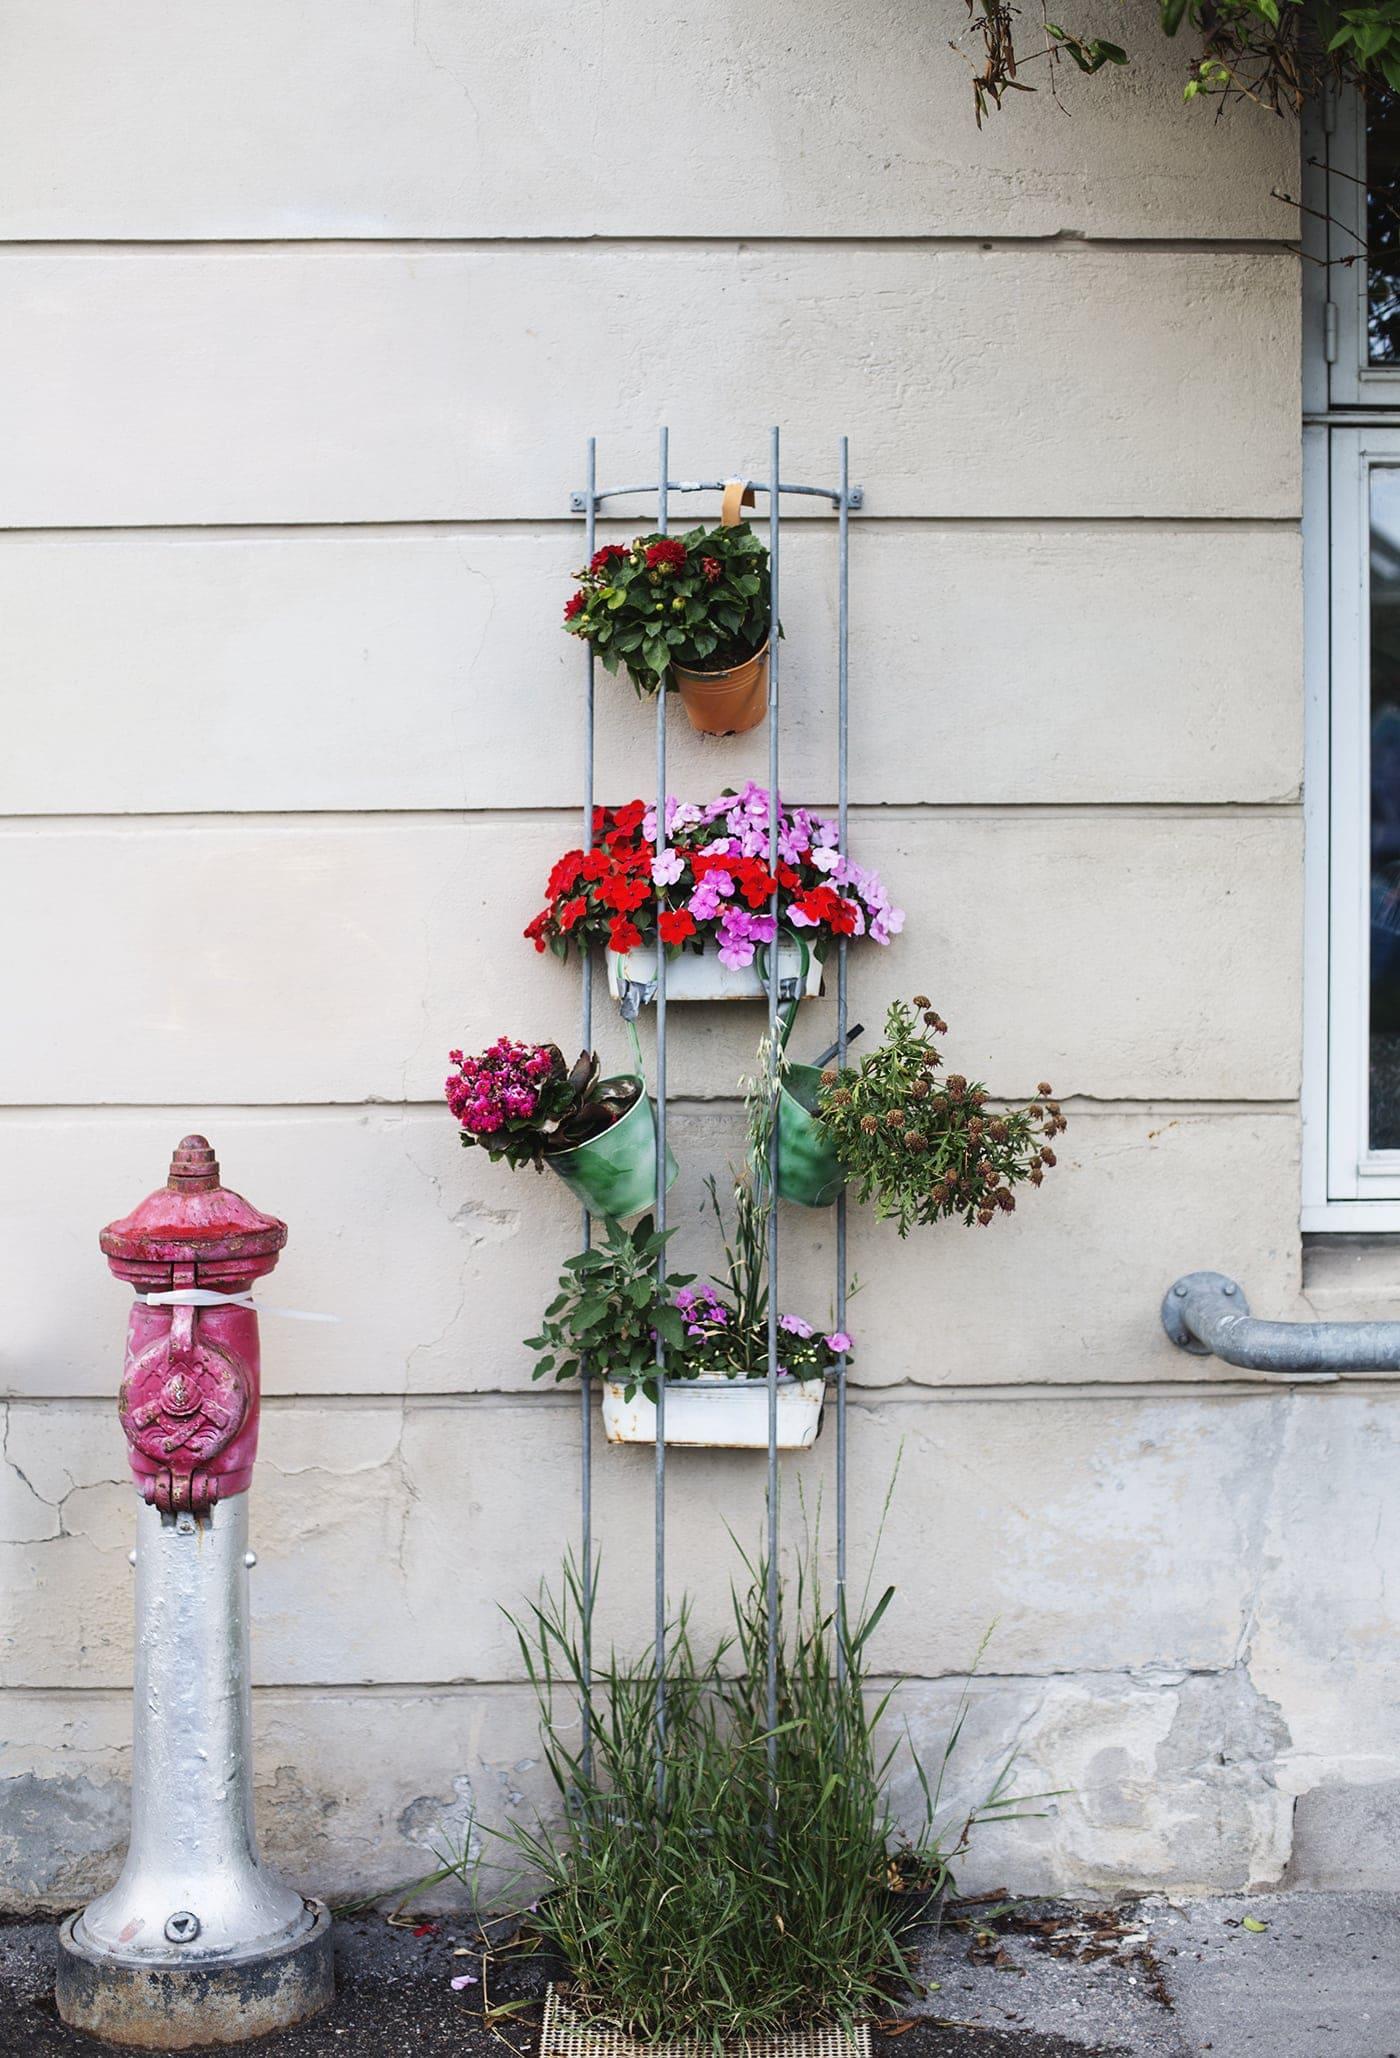 Copenhagen | wanderlust | street flowers